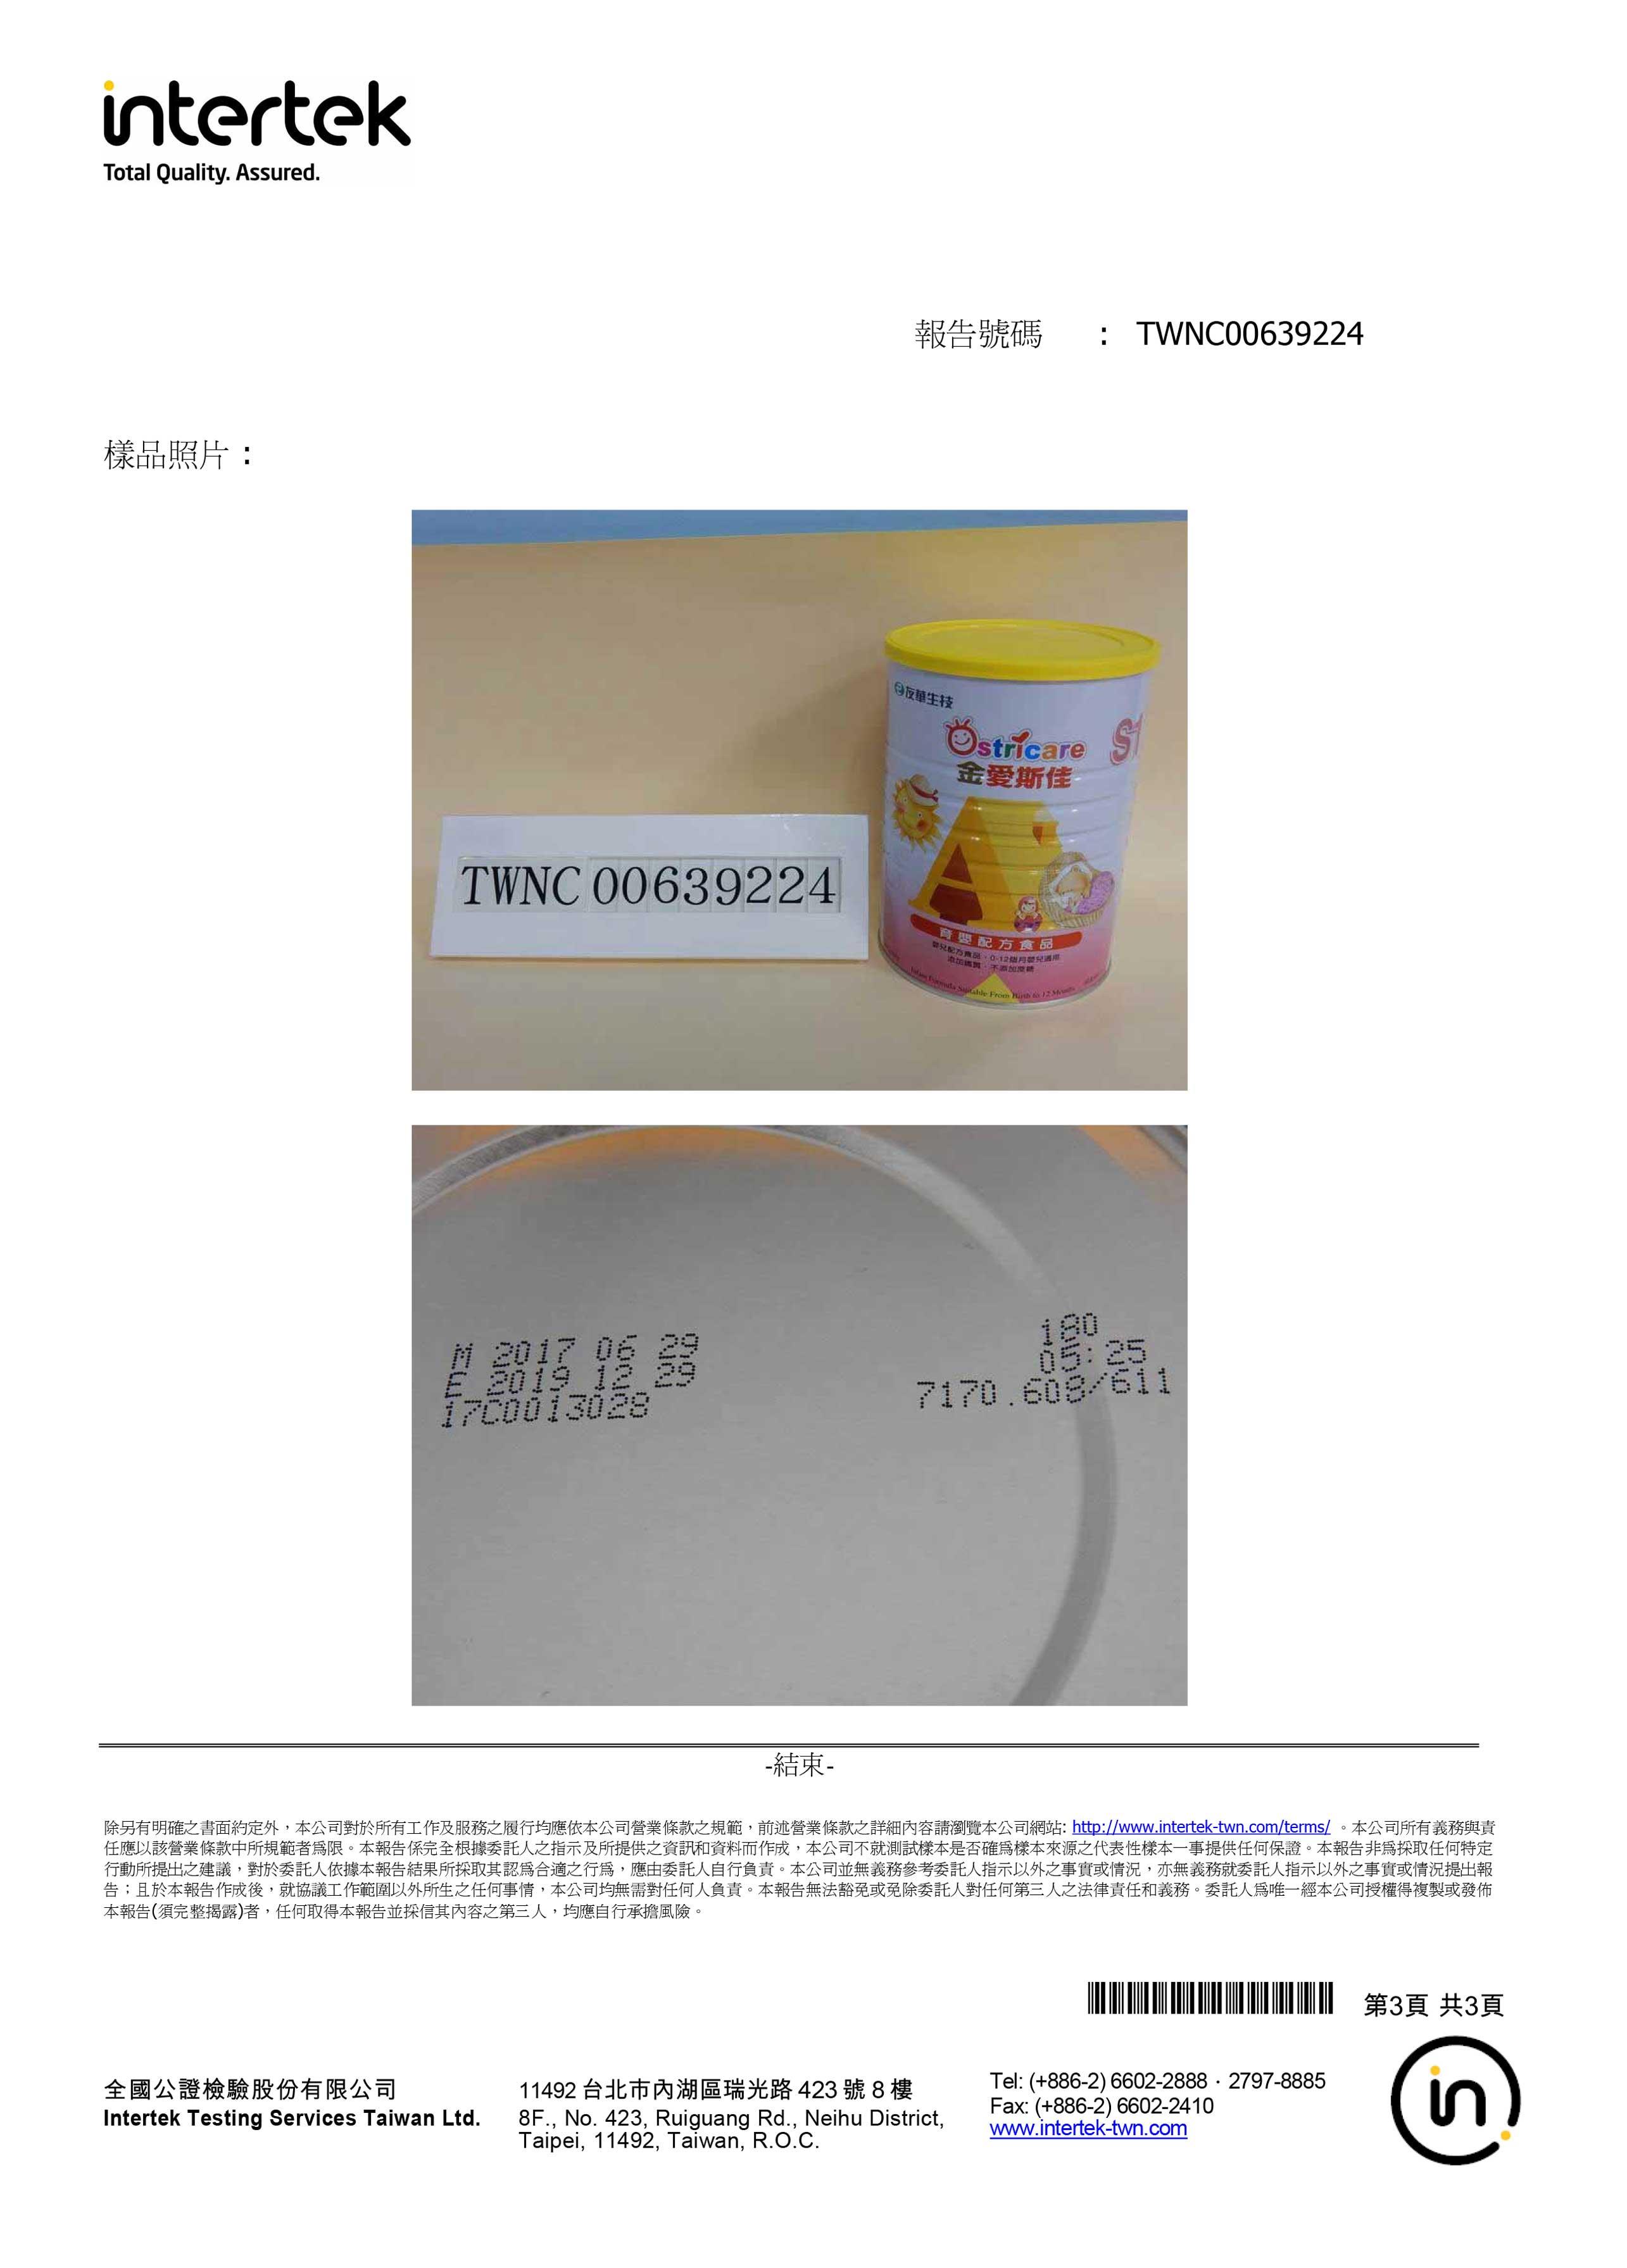 proimages/news/2017/Q3-42_金愛斯佳育嬰配方食品900g罐_檢驗報告_20171011-3.jpg